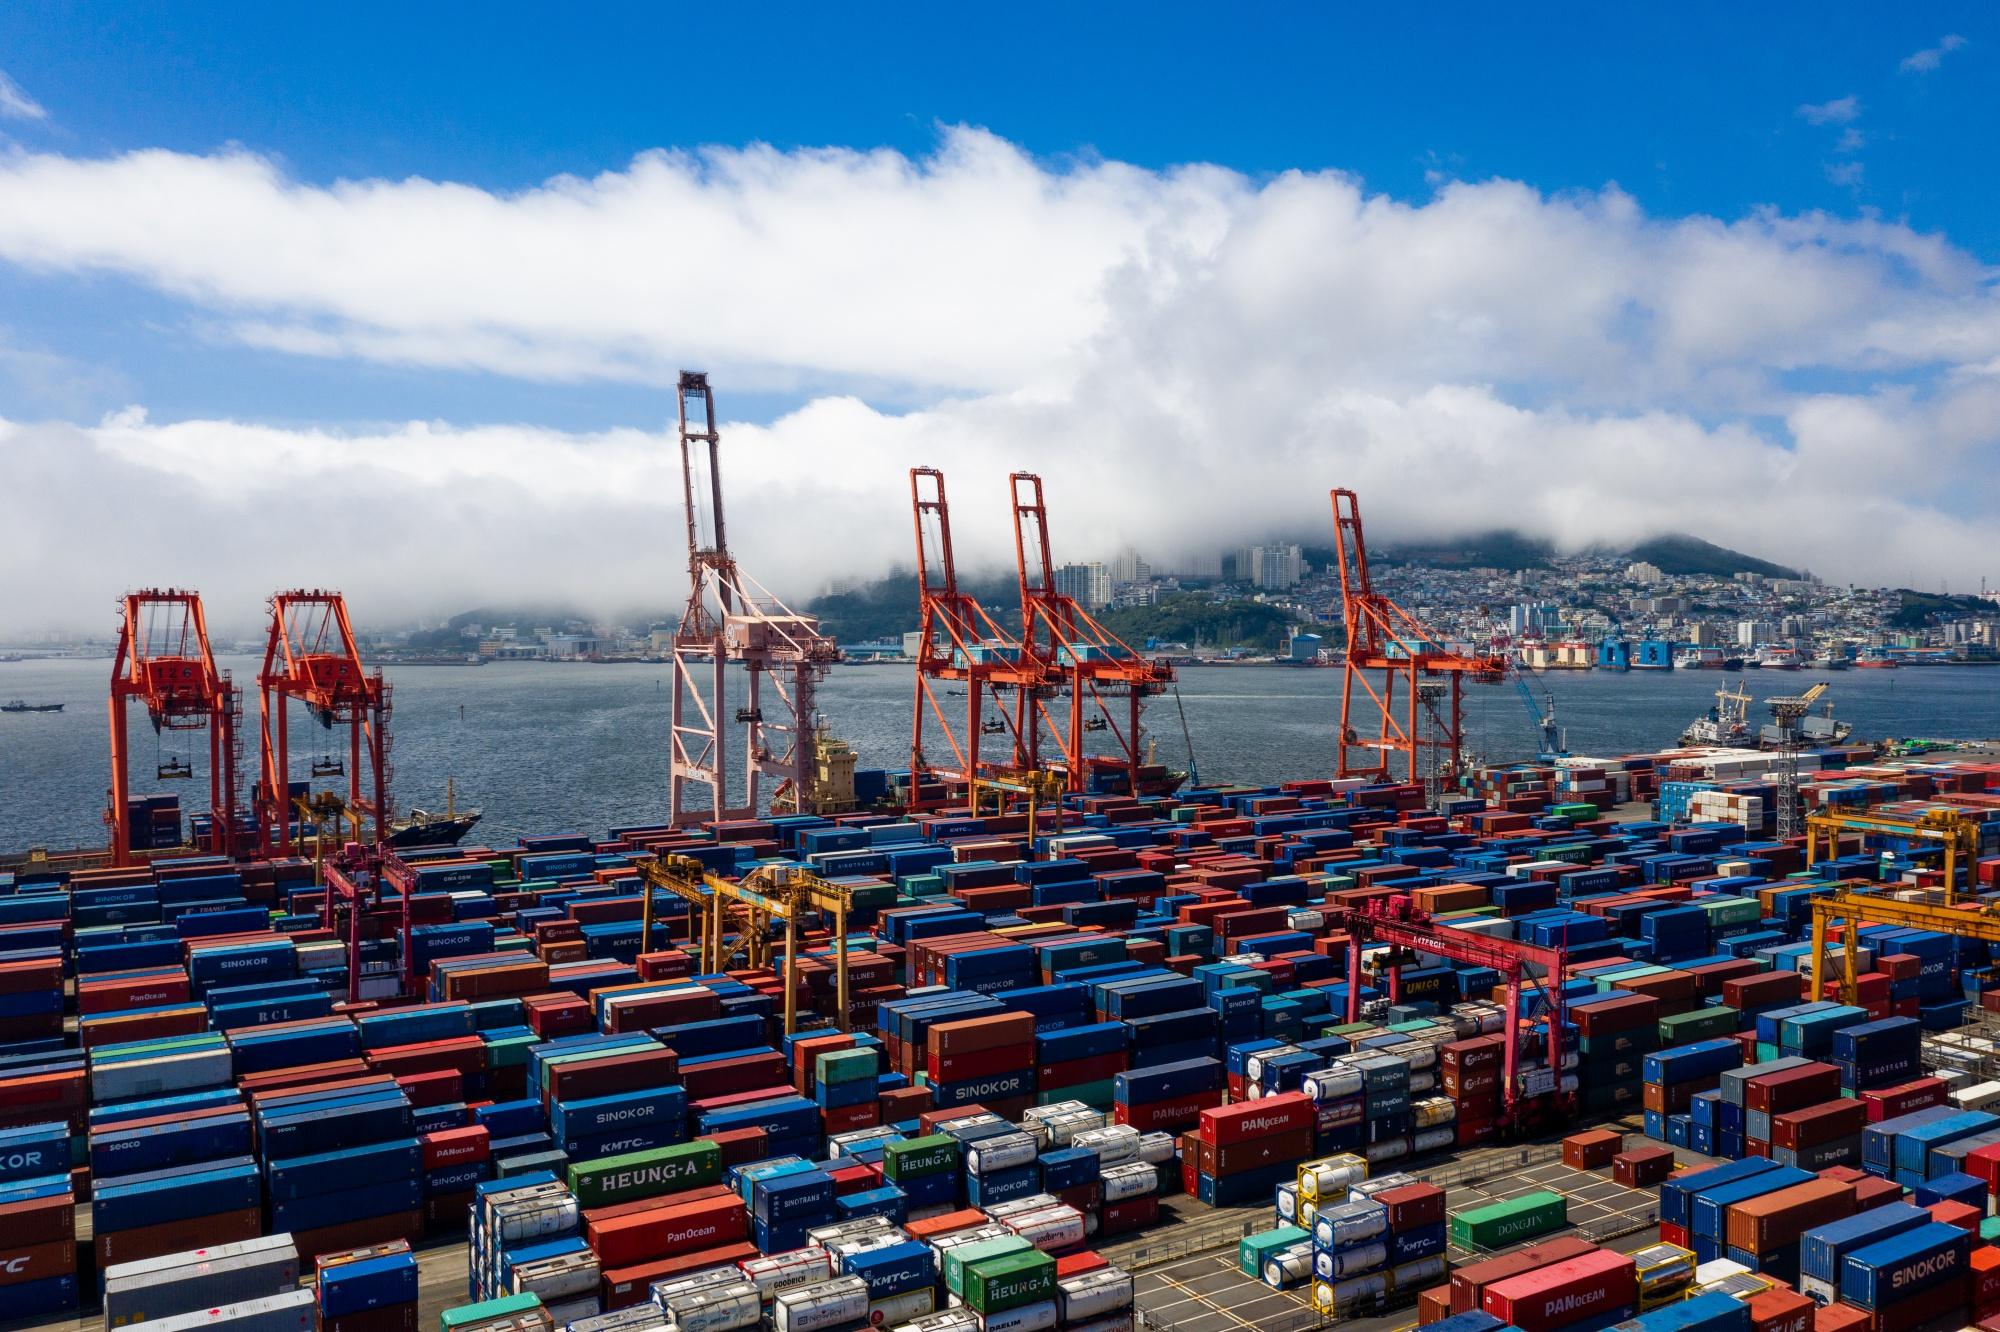 South Korea Moves to Downgrade Japan Trade Ties, Seeks Talks